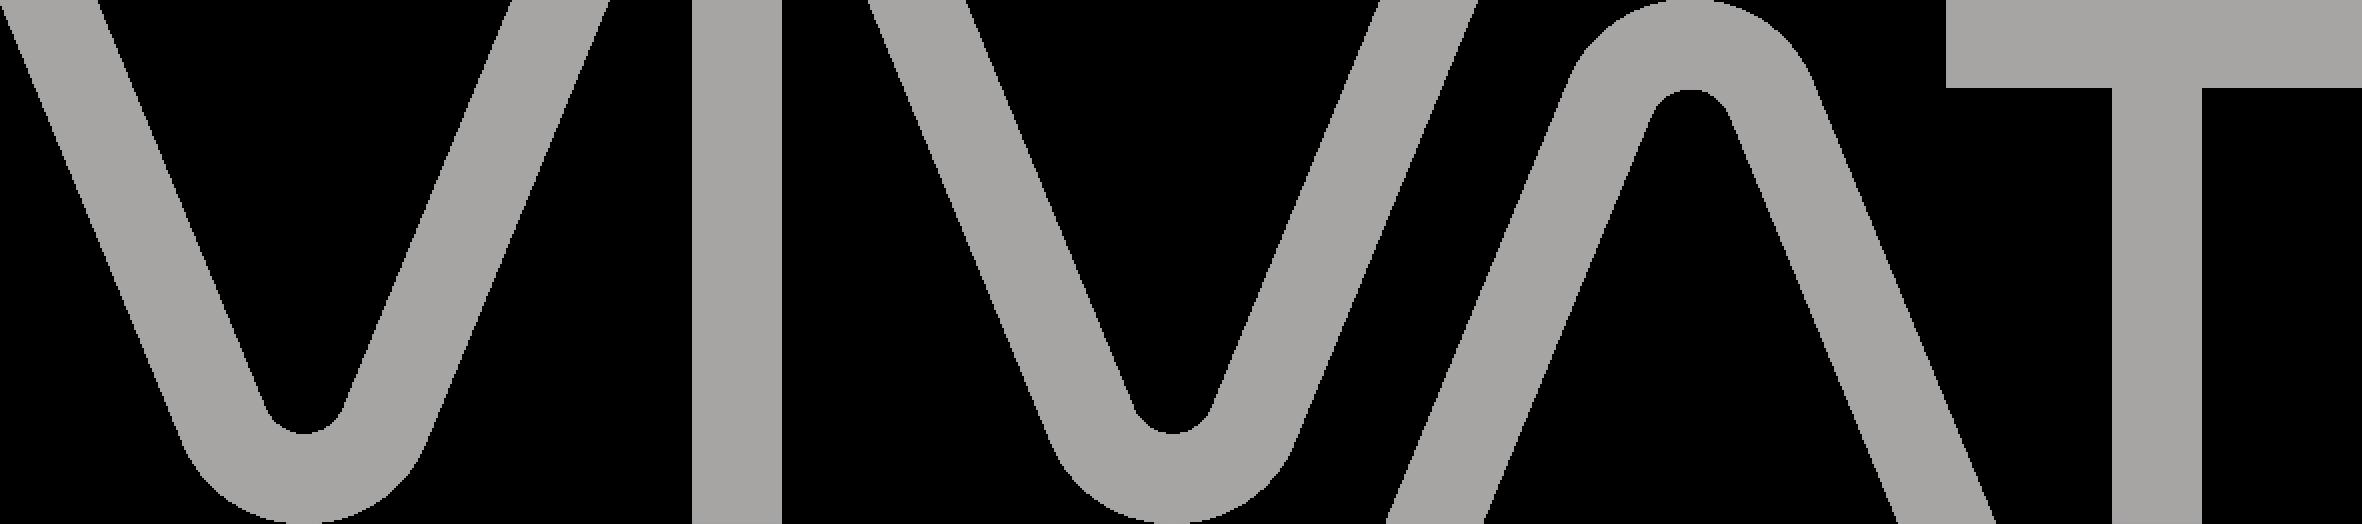 grey-Vivat-logo.png